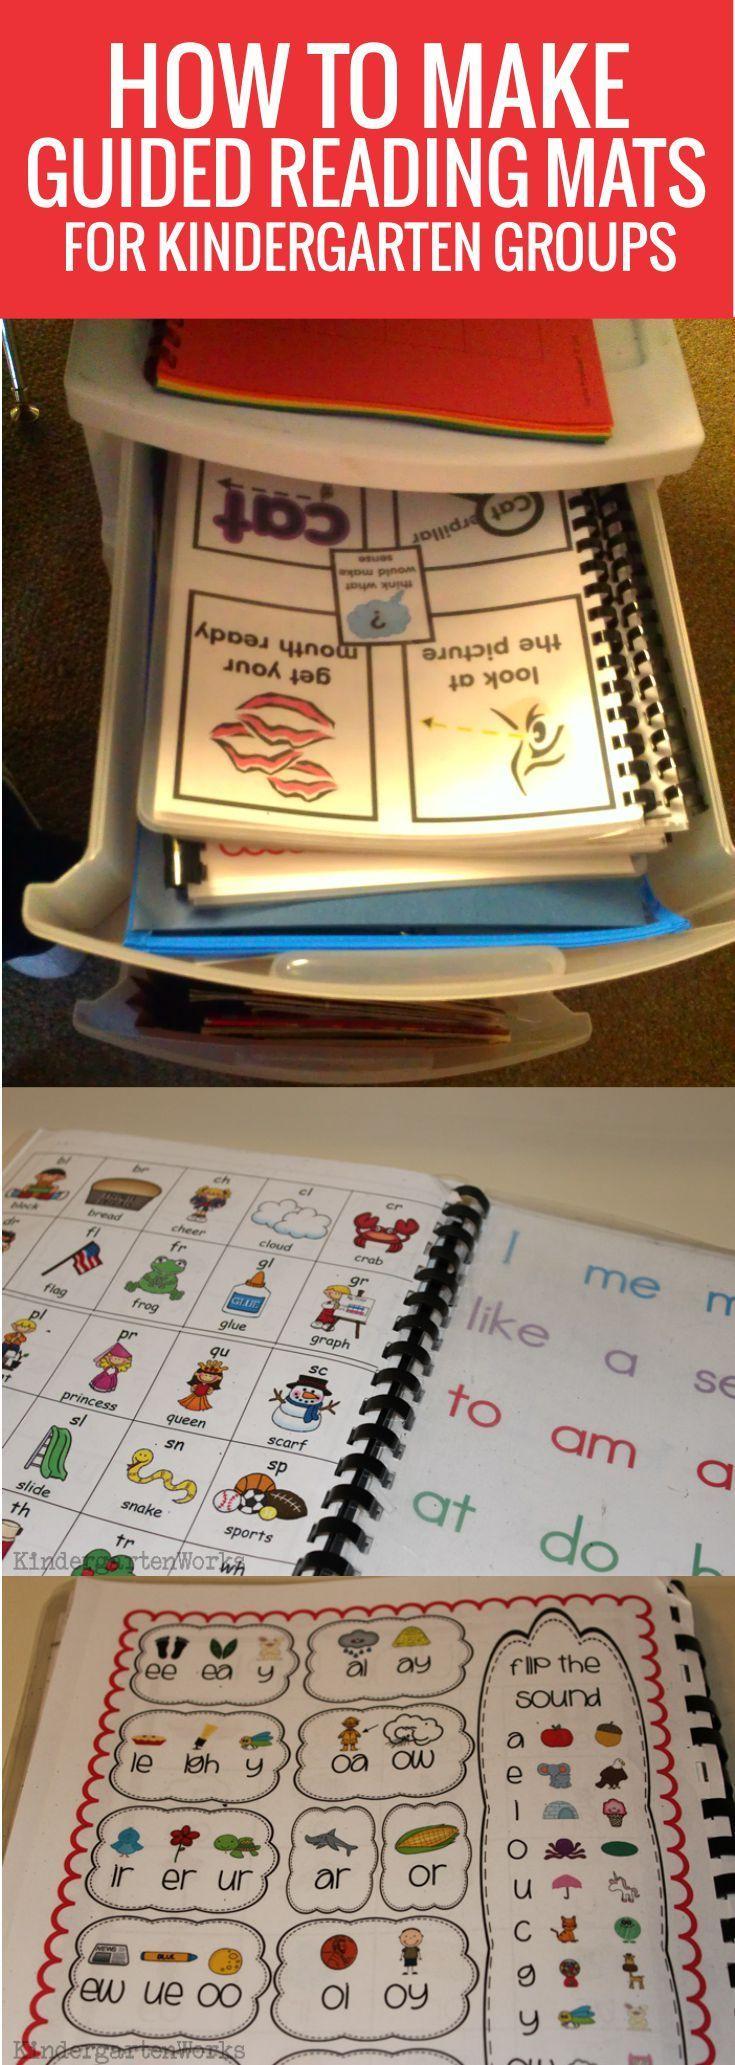 Handy Guided Reading Mats for Kindergarten Groups